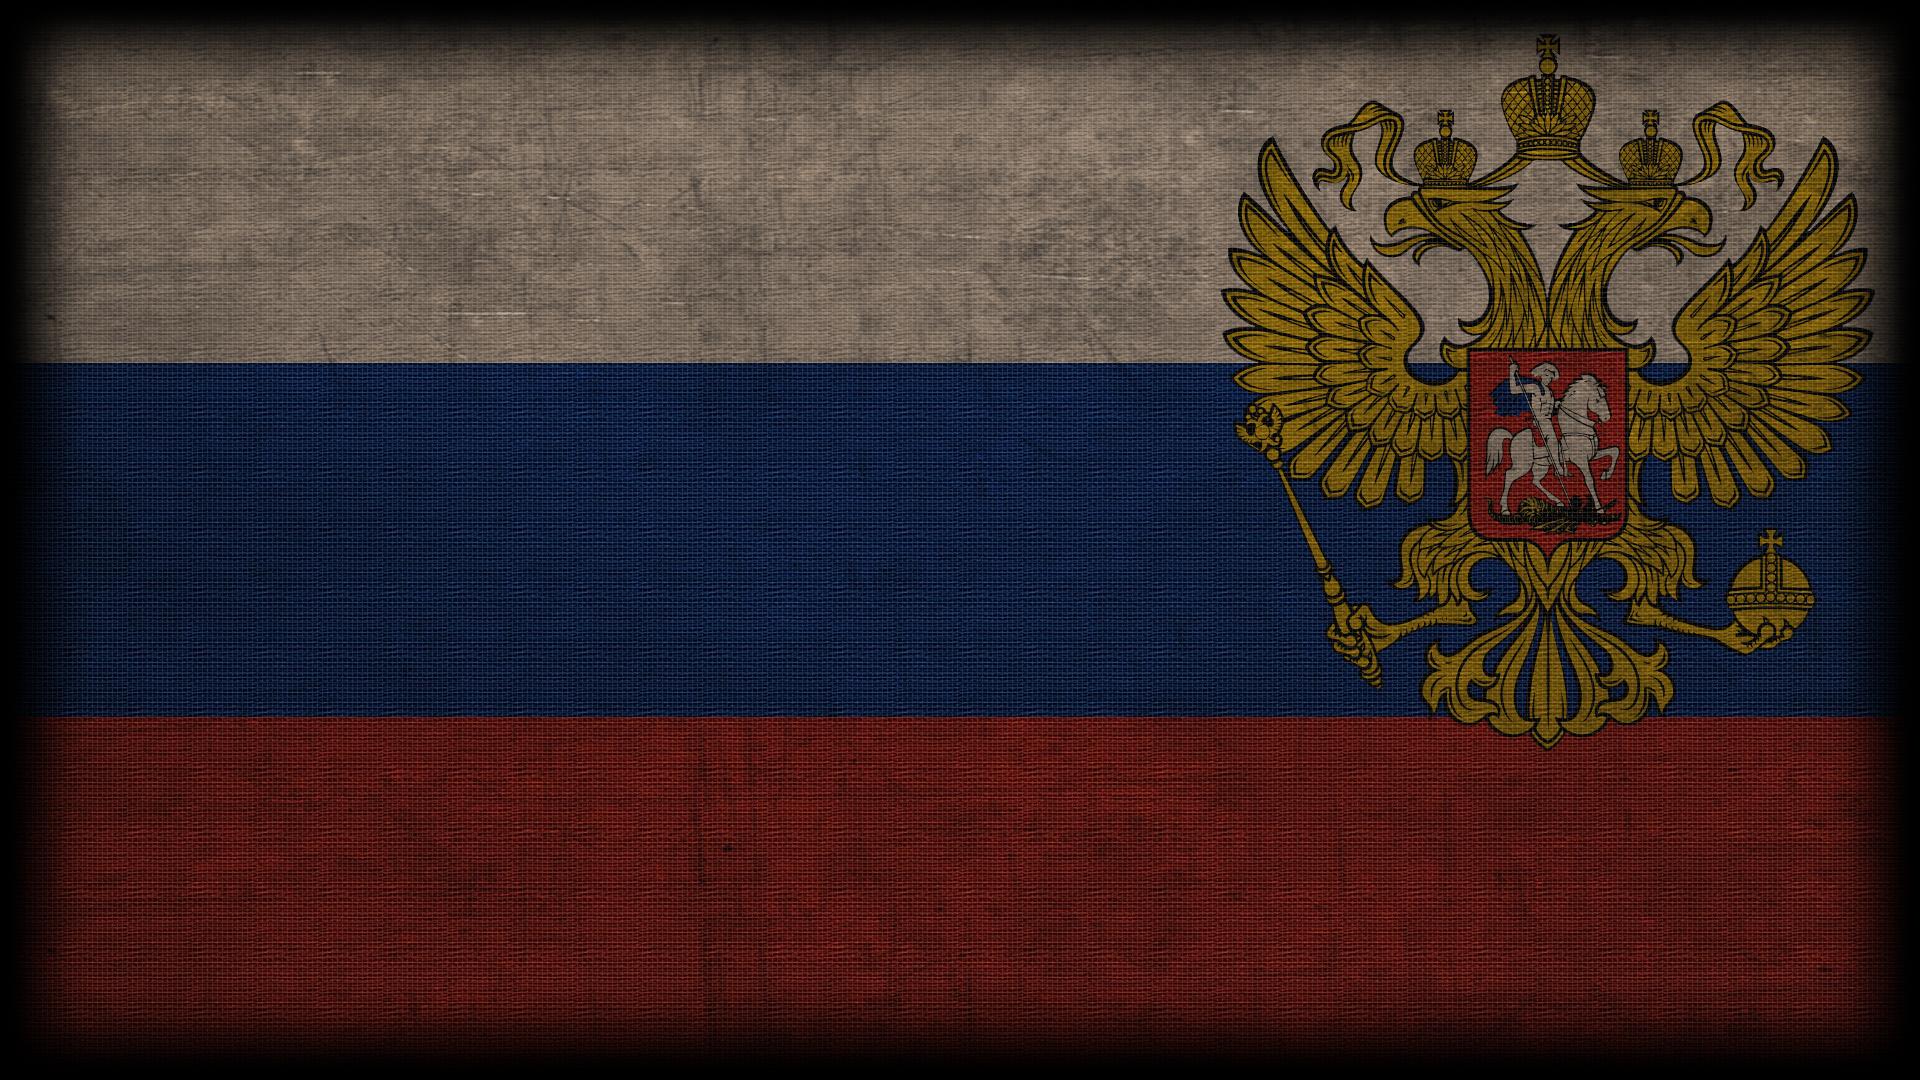 фото профиля на фоне рф флага этот день